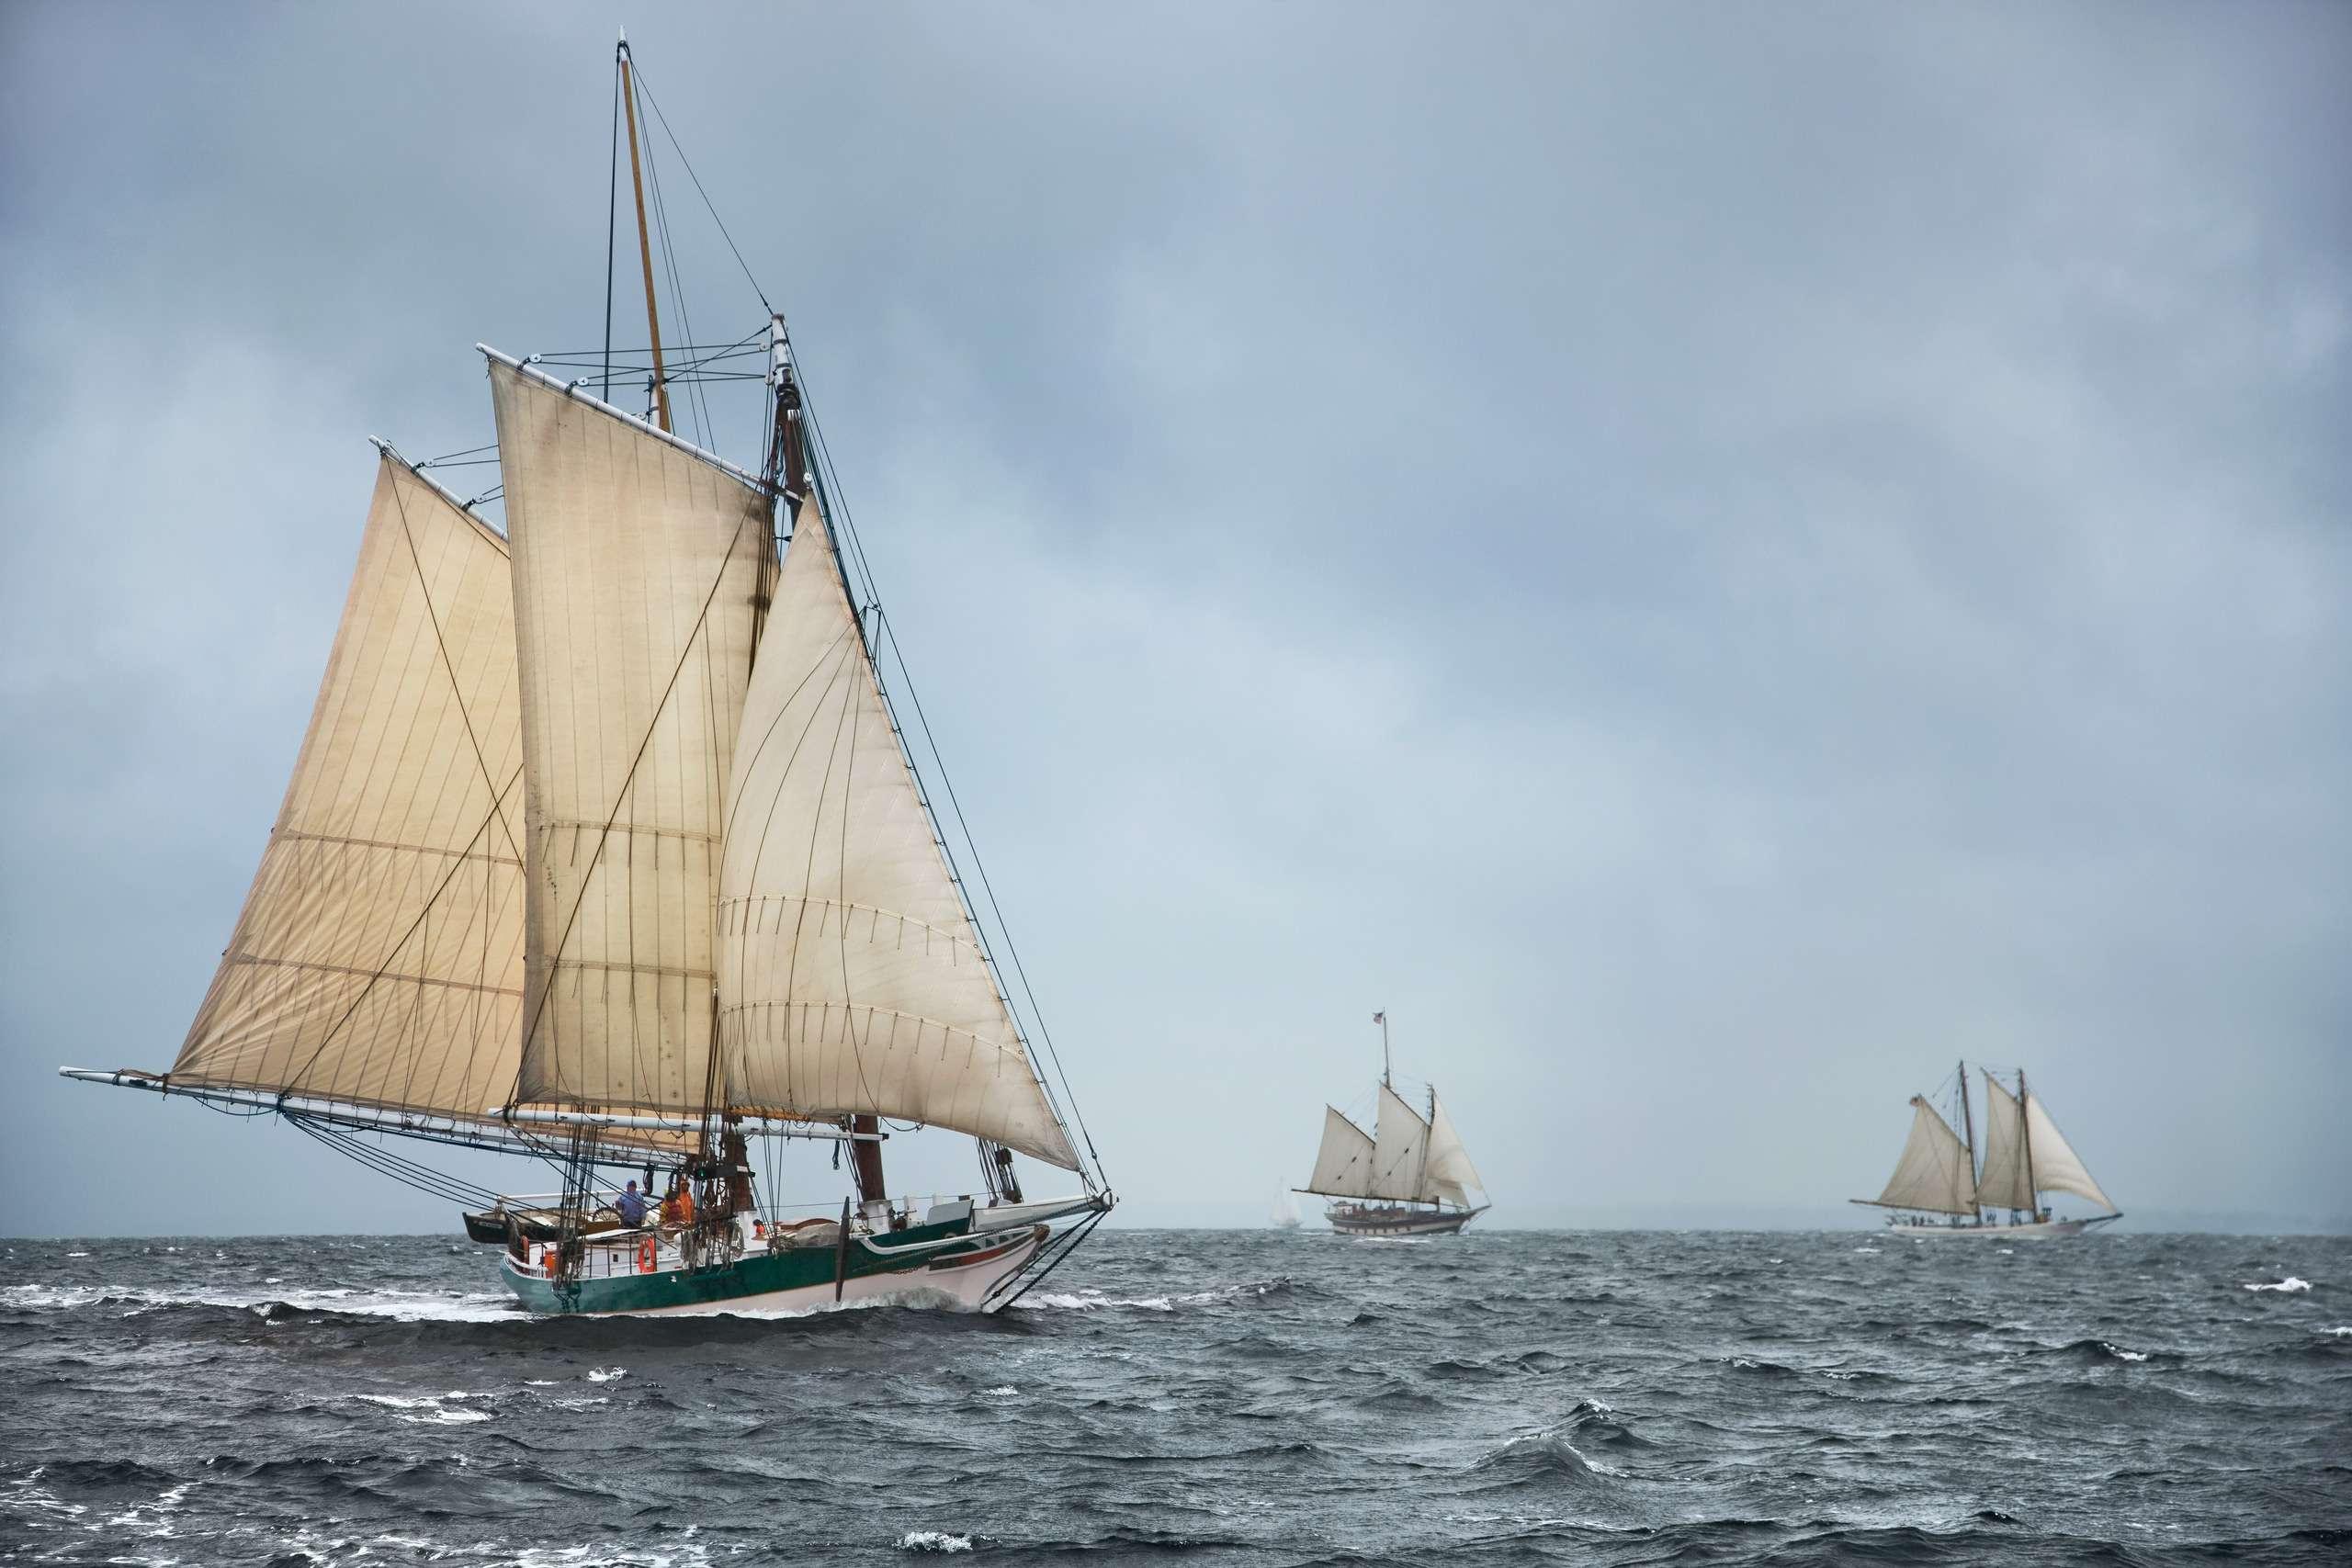 PORTFOLIO - Sailing - Tall Ships #2   PCG601